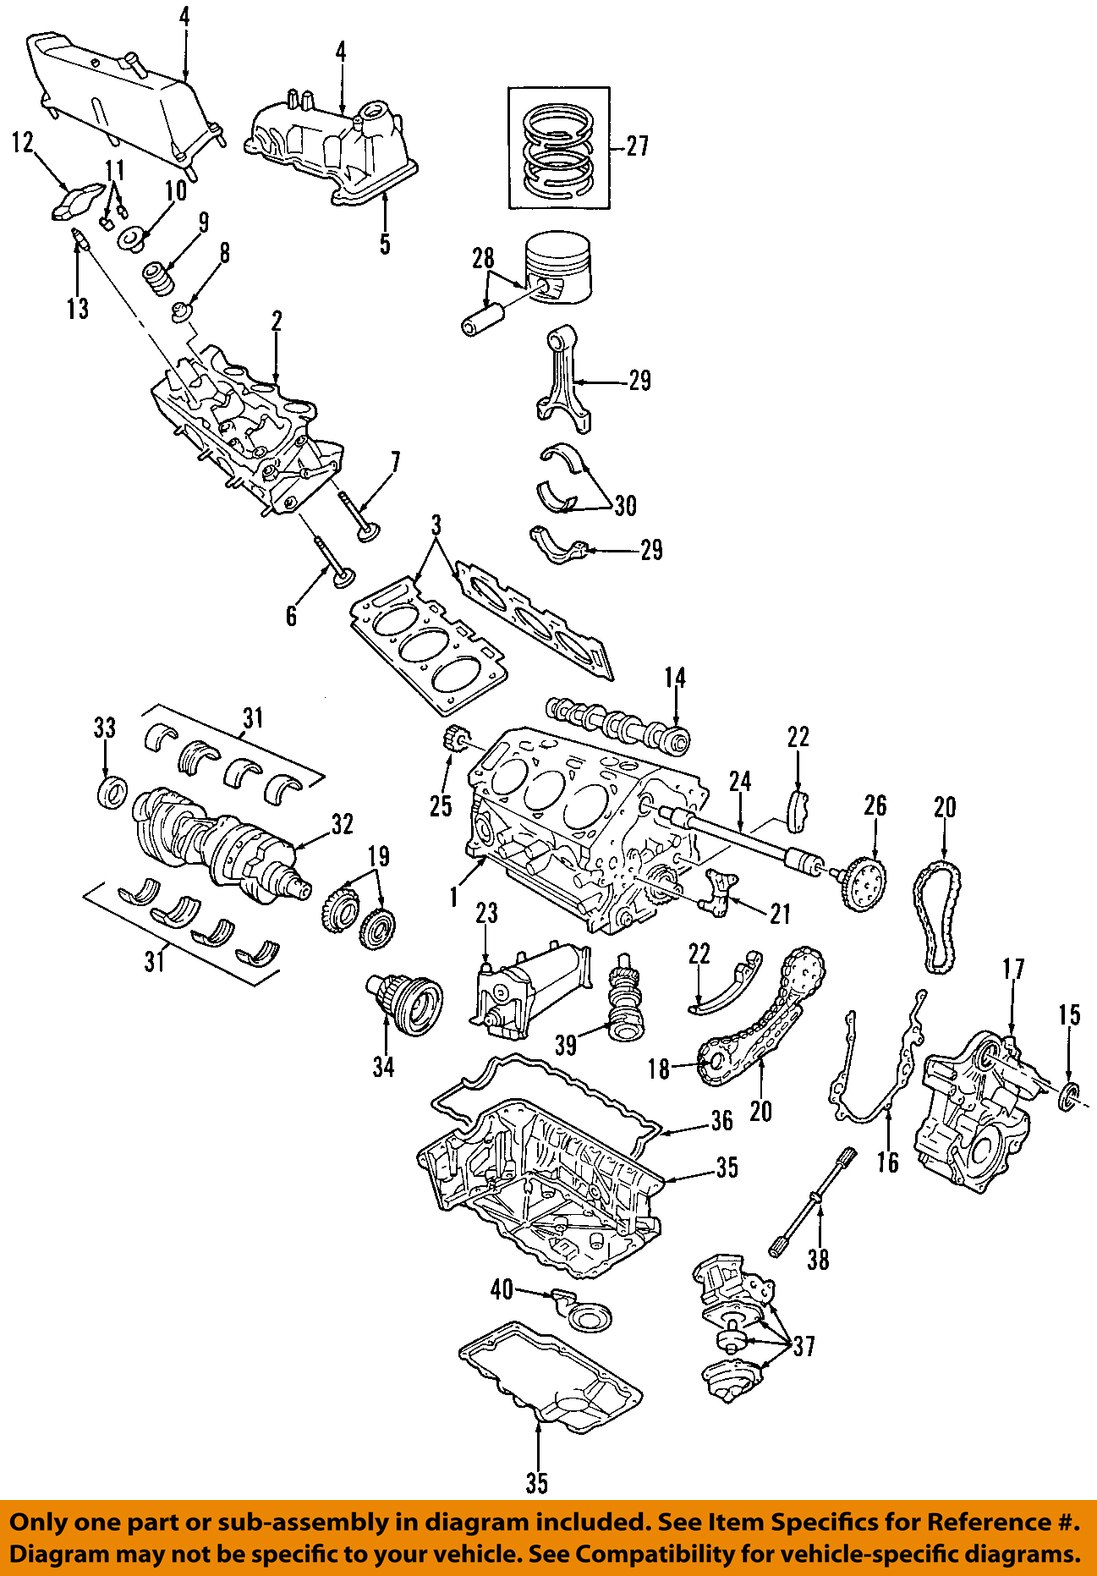 v8 ford engine diagram 40 ford engine diagram crankshaft ford oem-engine crankshaft crank seal 5h2z6700aa | ebay